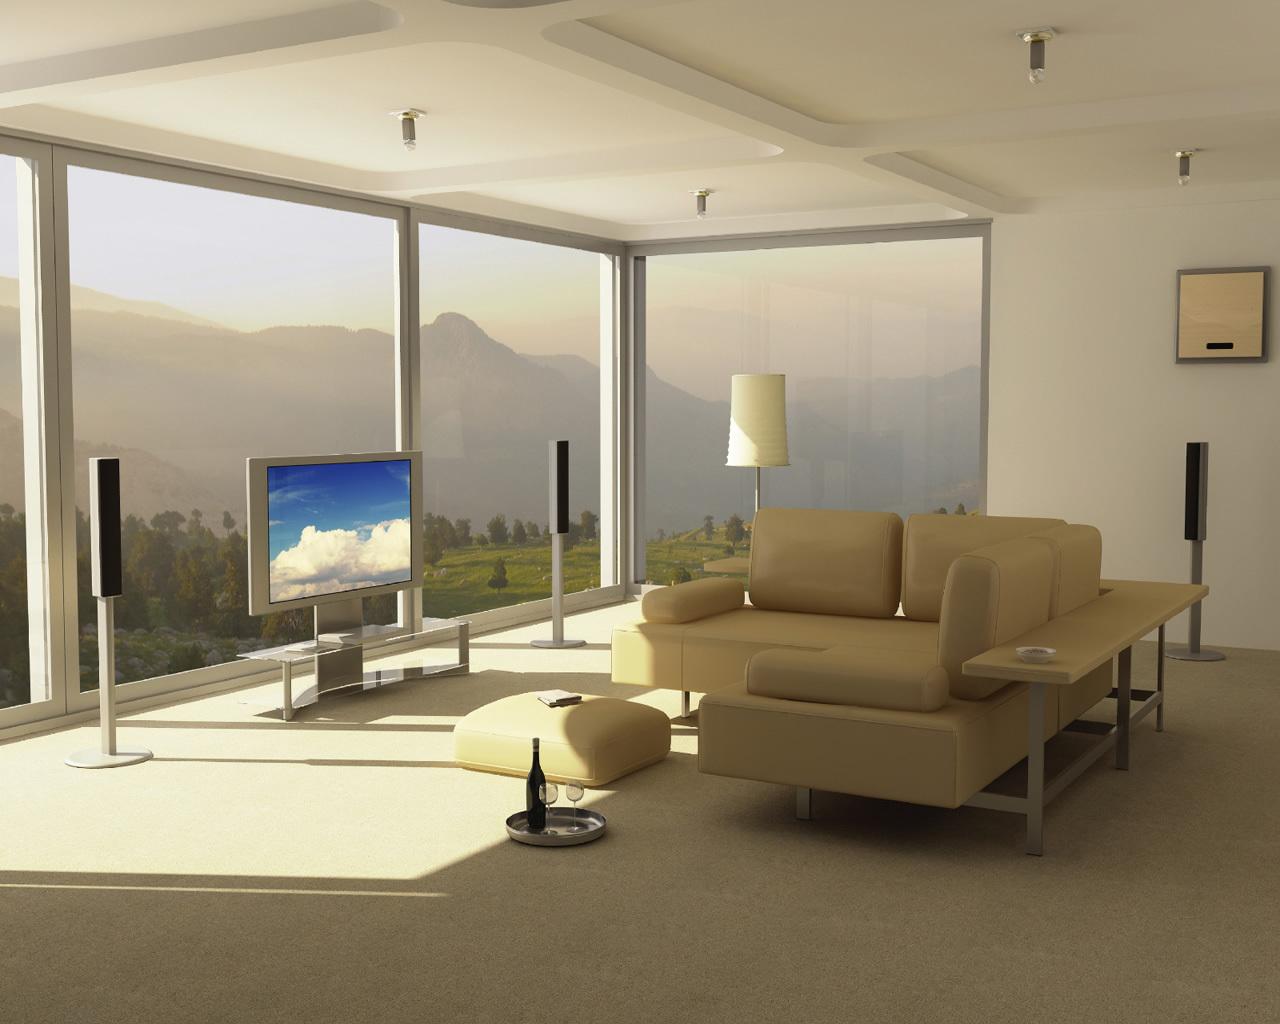 Home Design Ideas Interior Design Vs Interior Decorating Vs Home 1280x1024